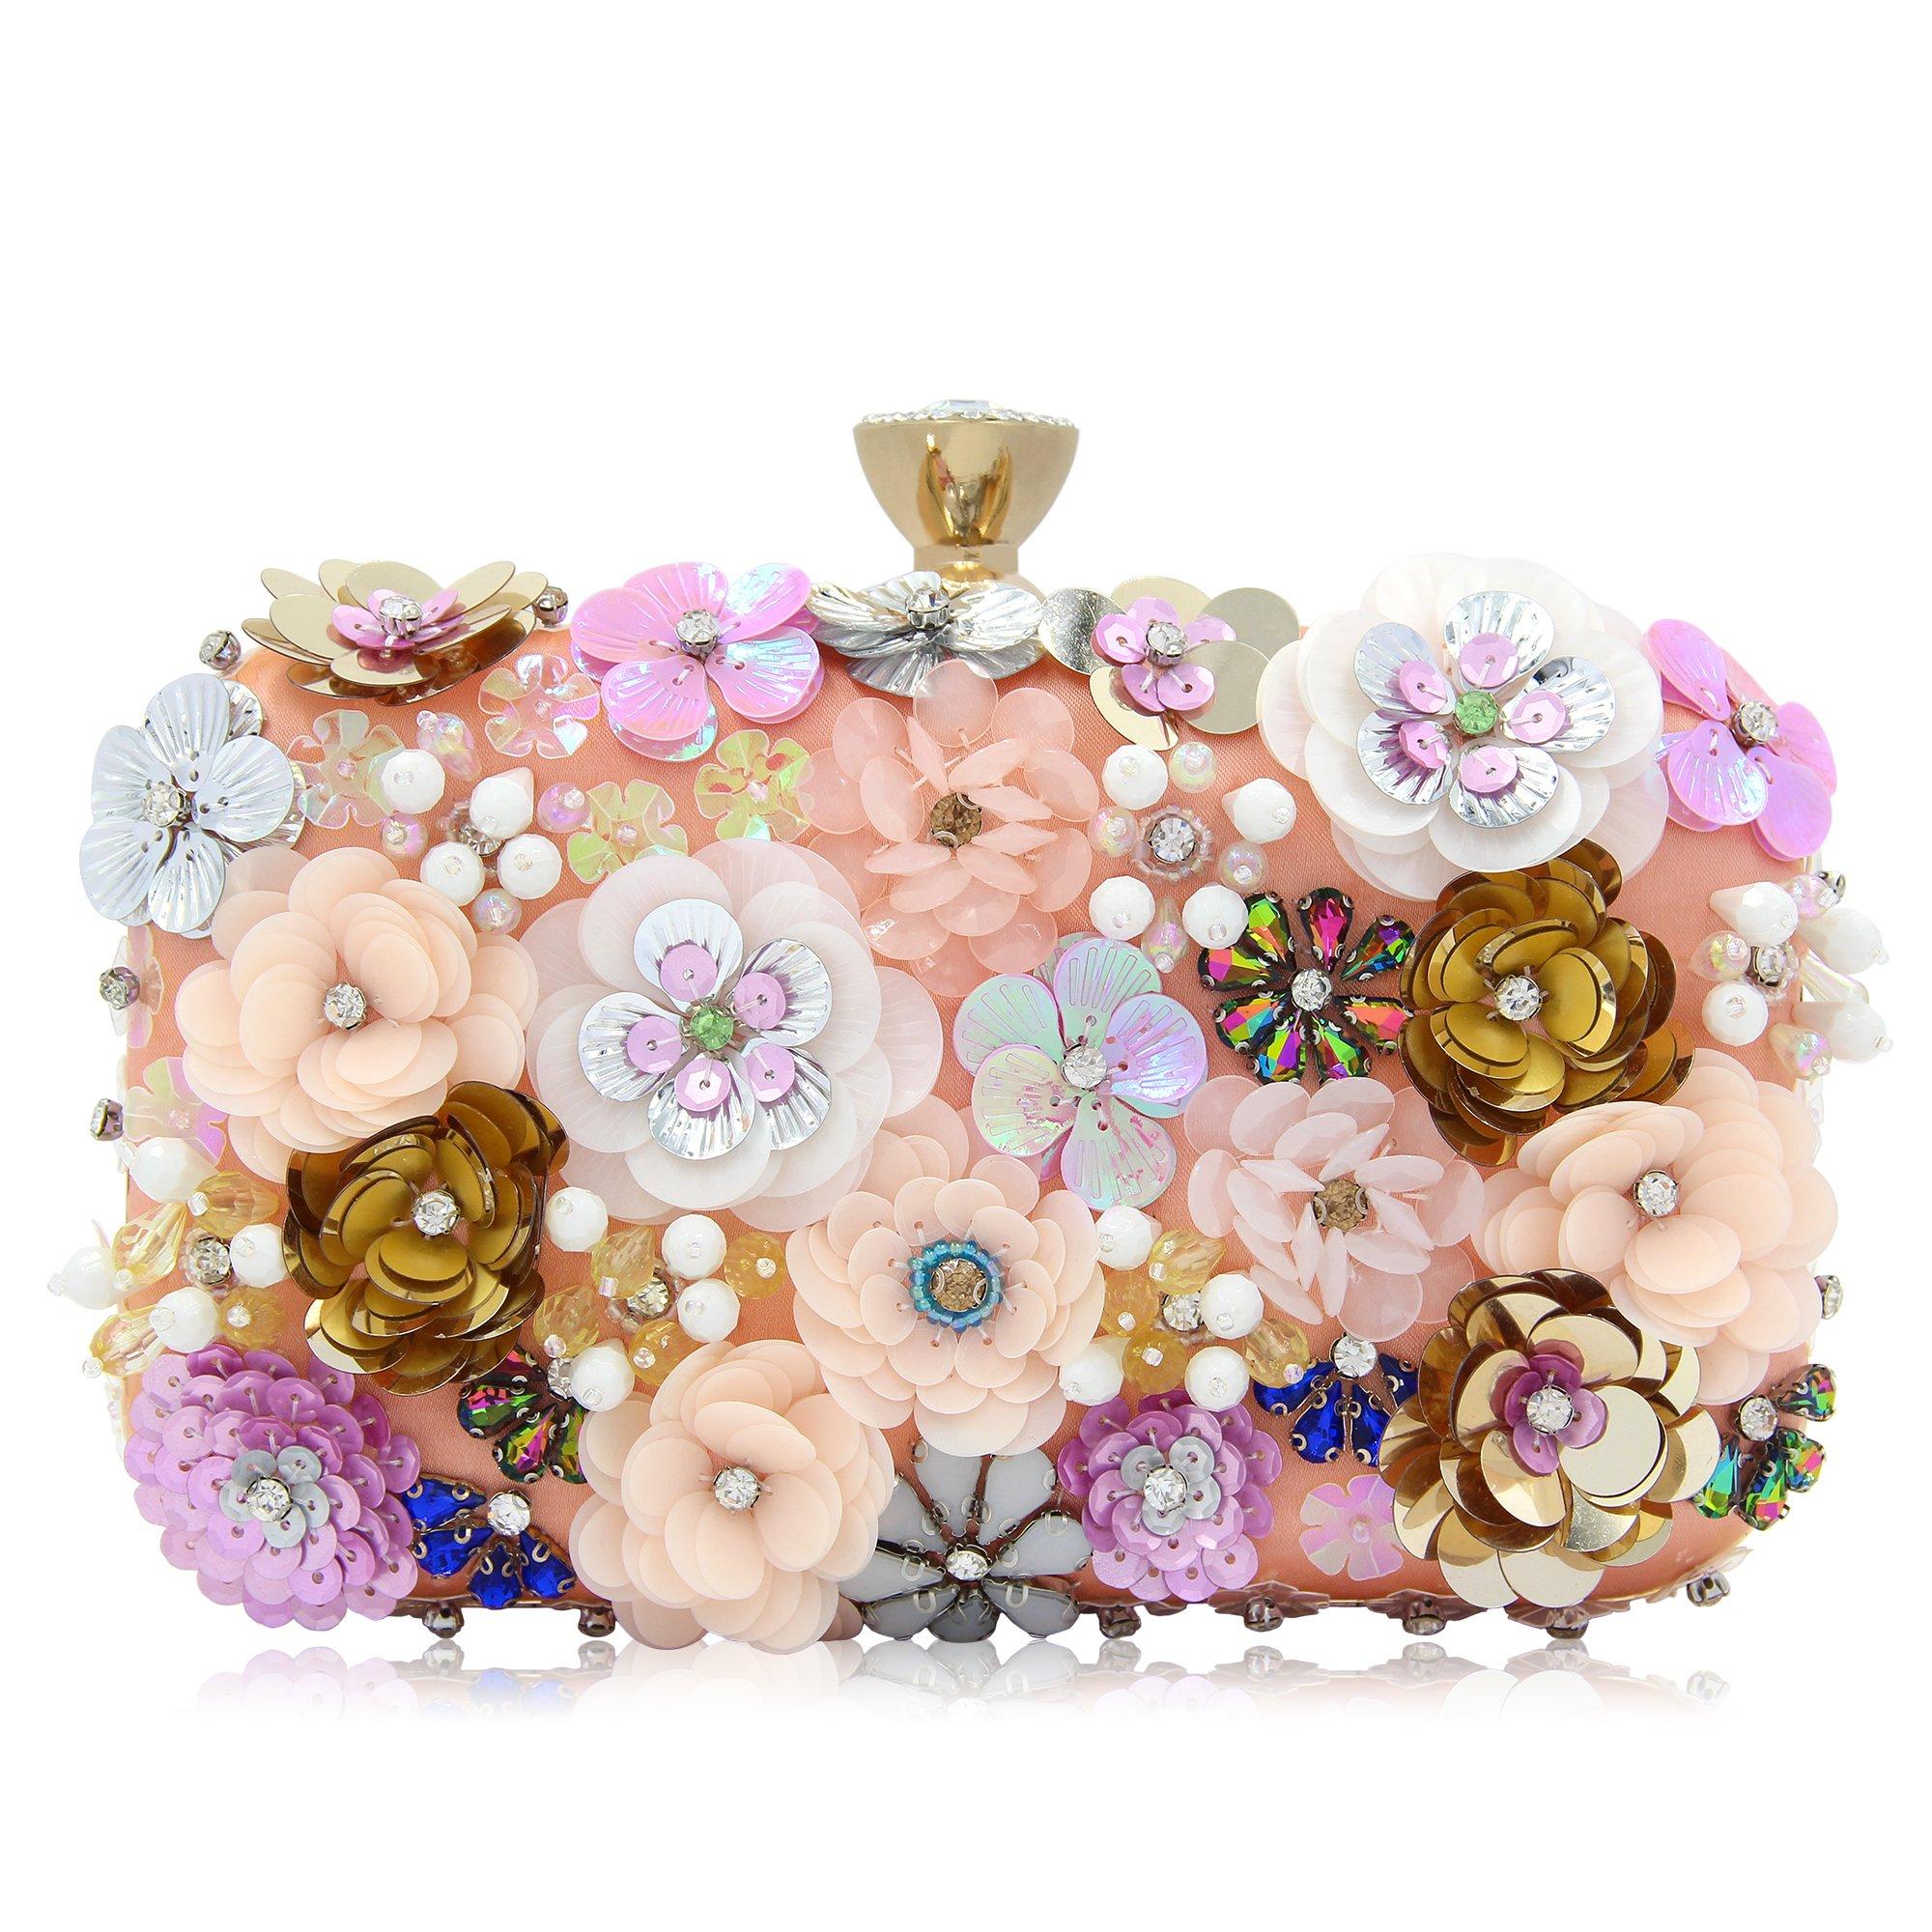 Milisente Women Clutches Colorful Flower Evening Bag Sequins Satin Evening Clutch by Milisente